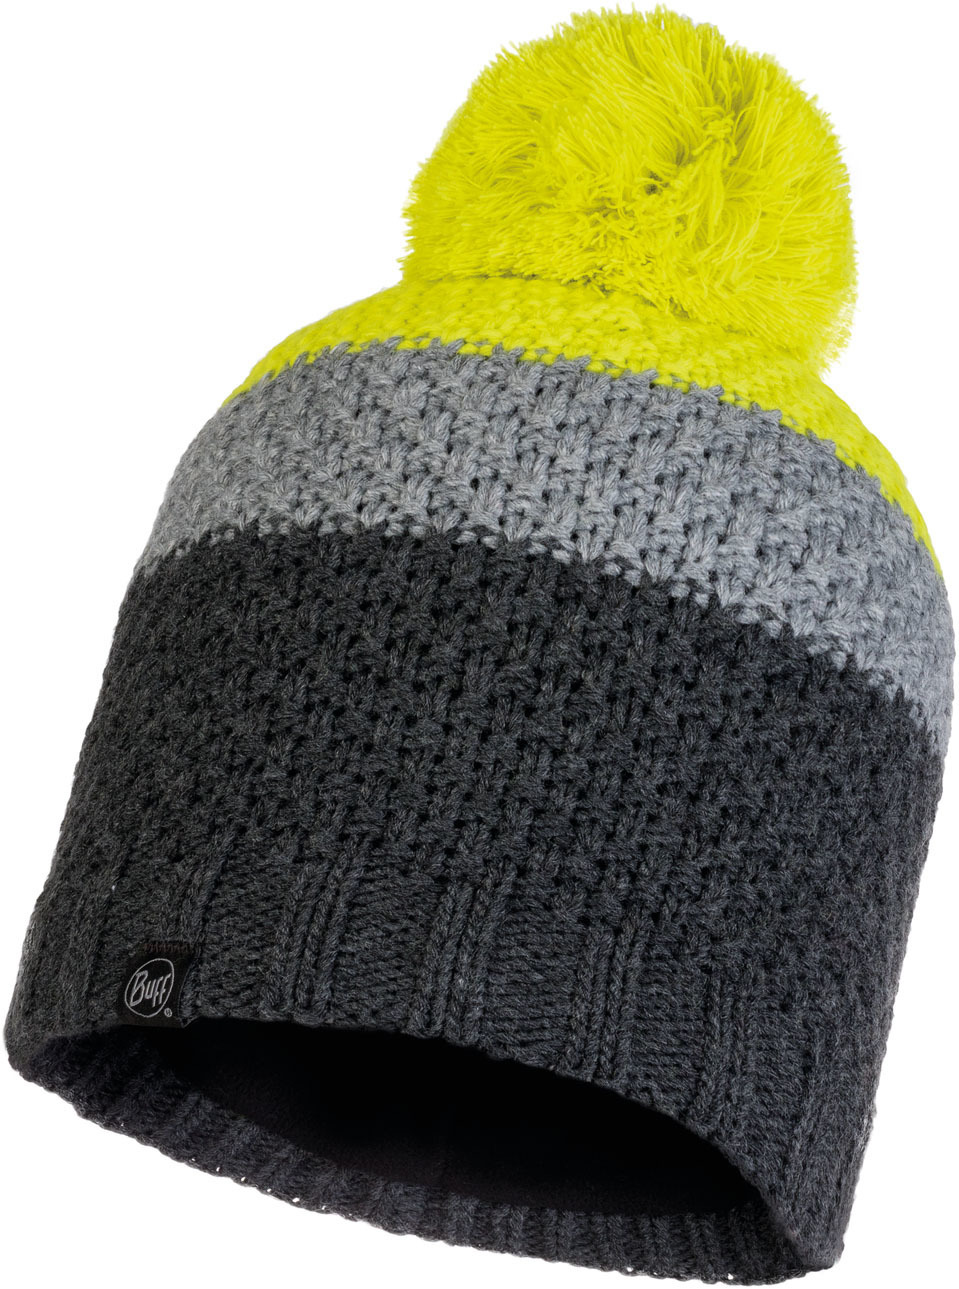 Шапки с помпоном Шапка вязаная с флисом Buff Hat Knitted Polar Jav Grey 120857.937.10.00.jpg